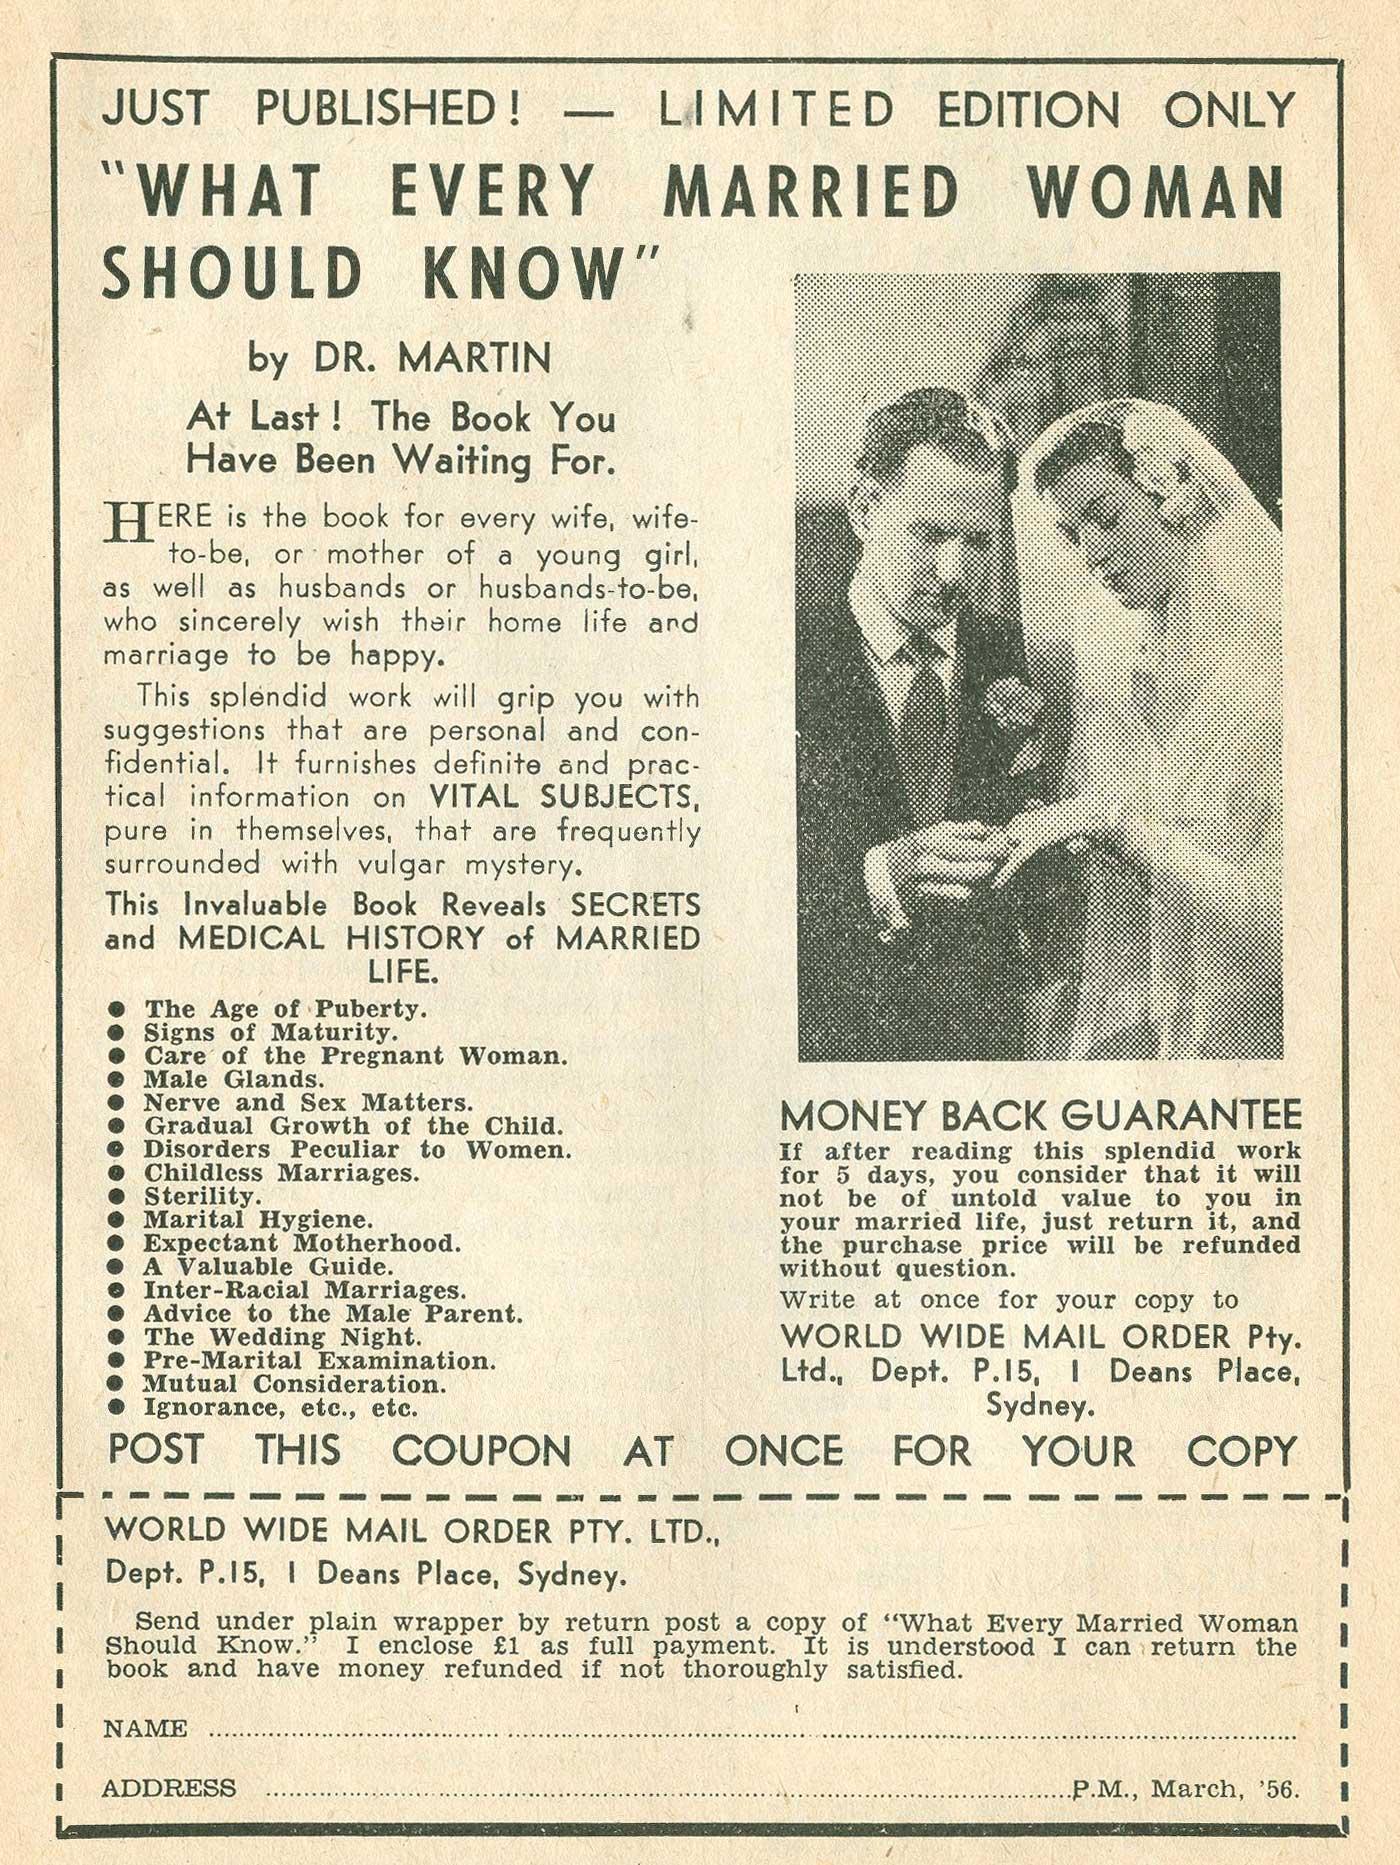 Tito recommend best of 19450sdrunken vintage sex retro